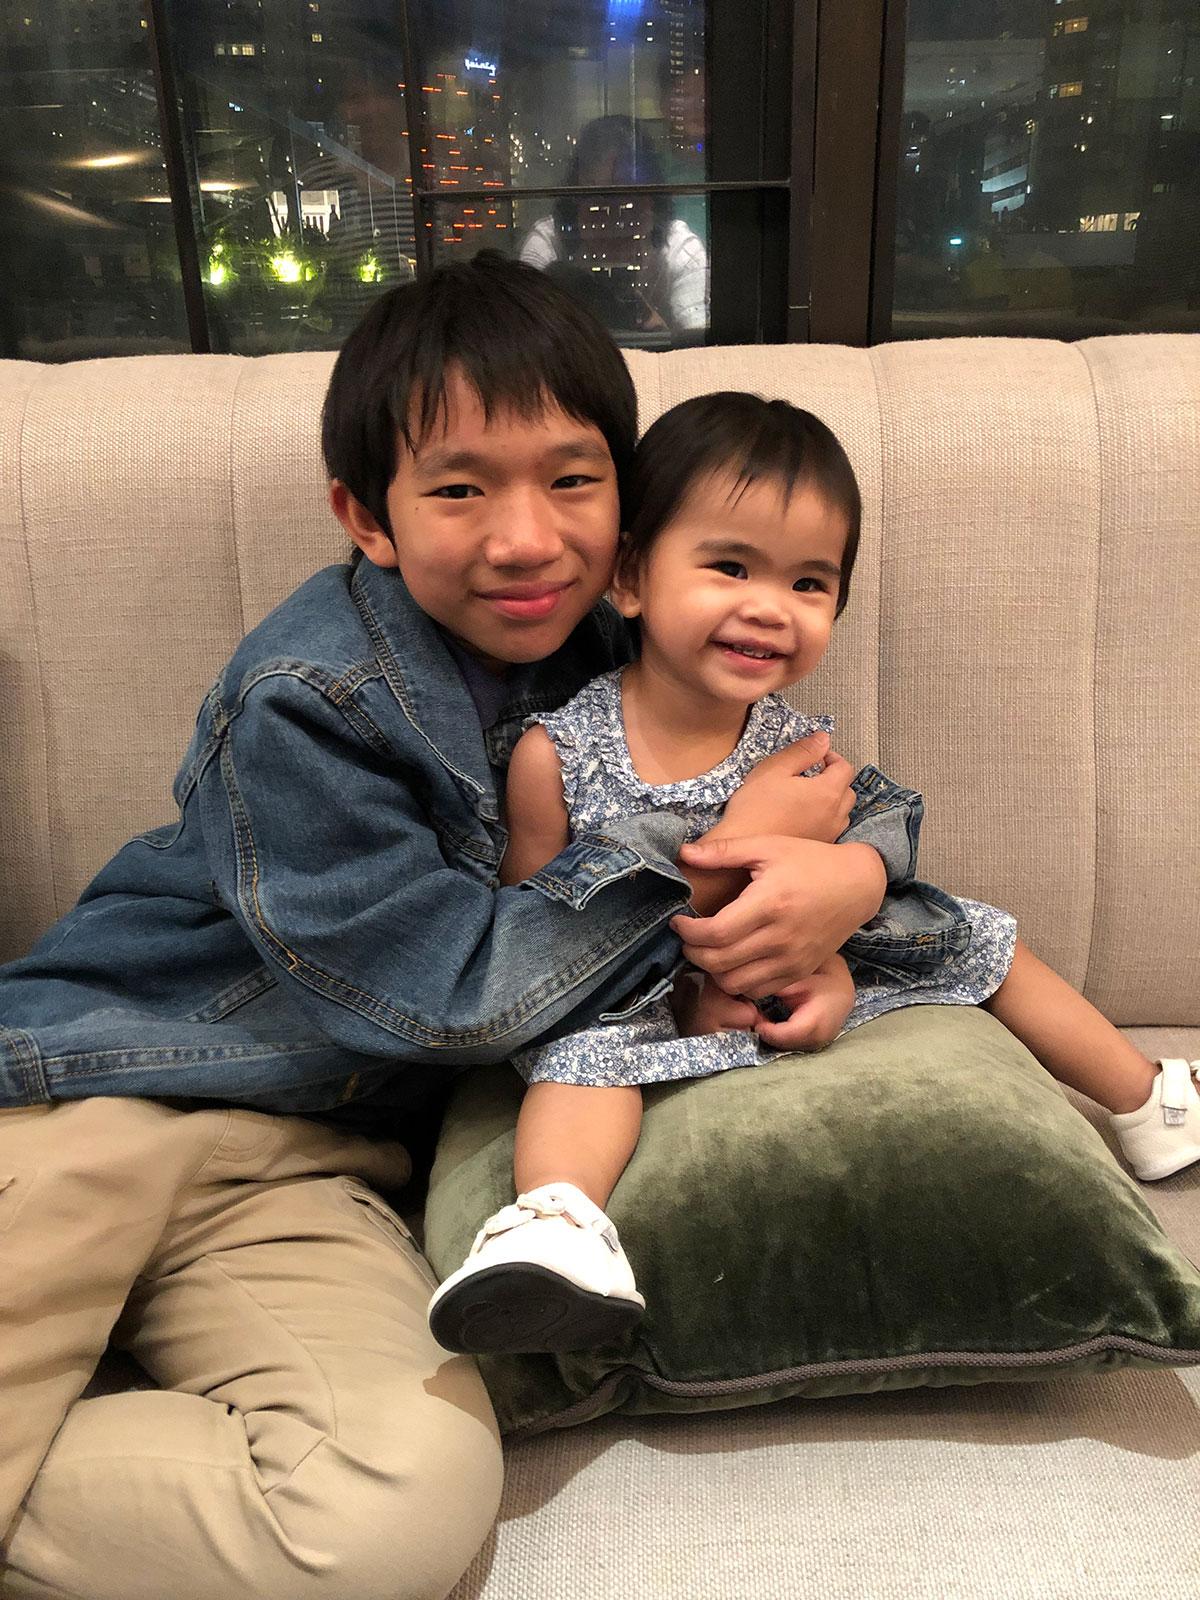 joshua and kaitlyn siblings adoptive